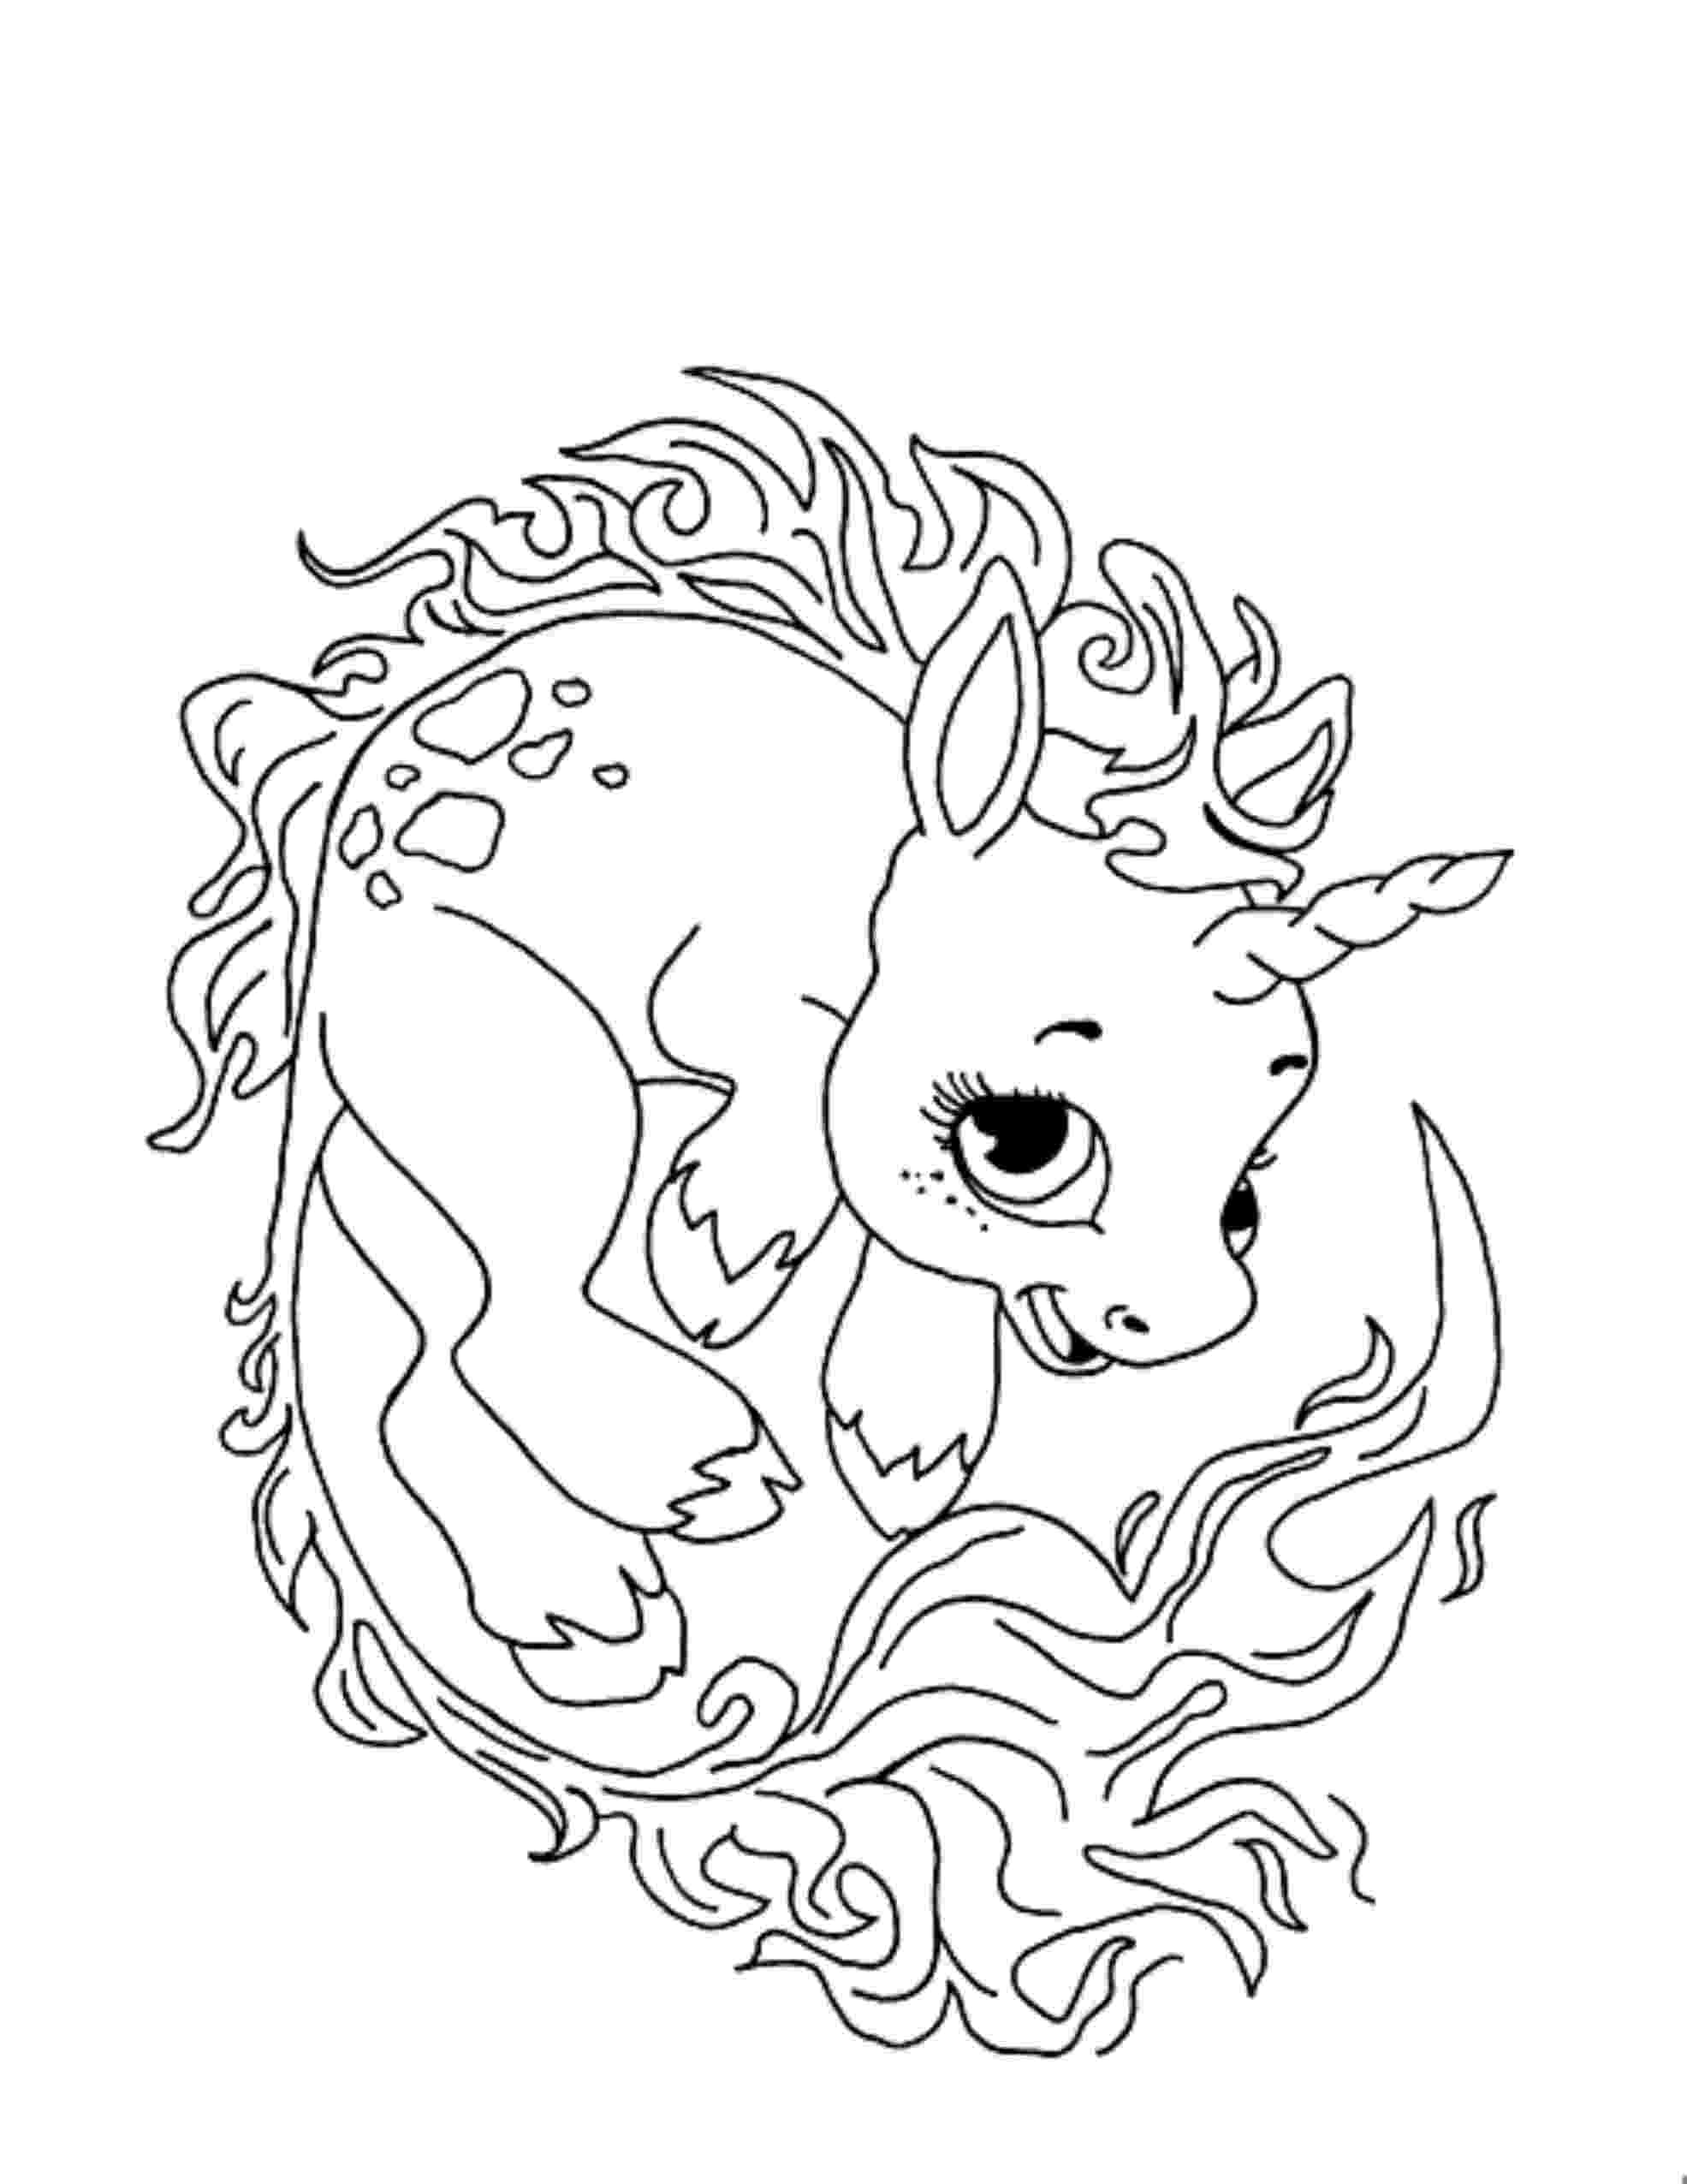 coloring page unicorn print download unicorn coloring pages for children coloring page unicorn